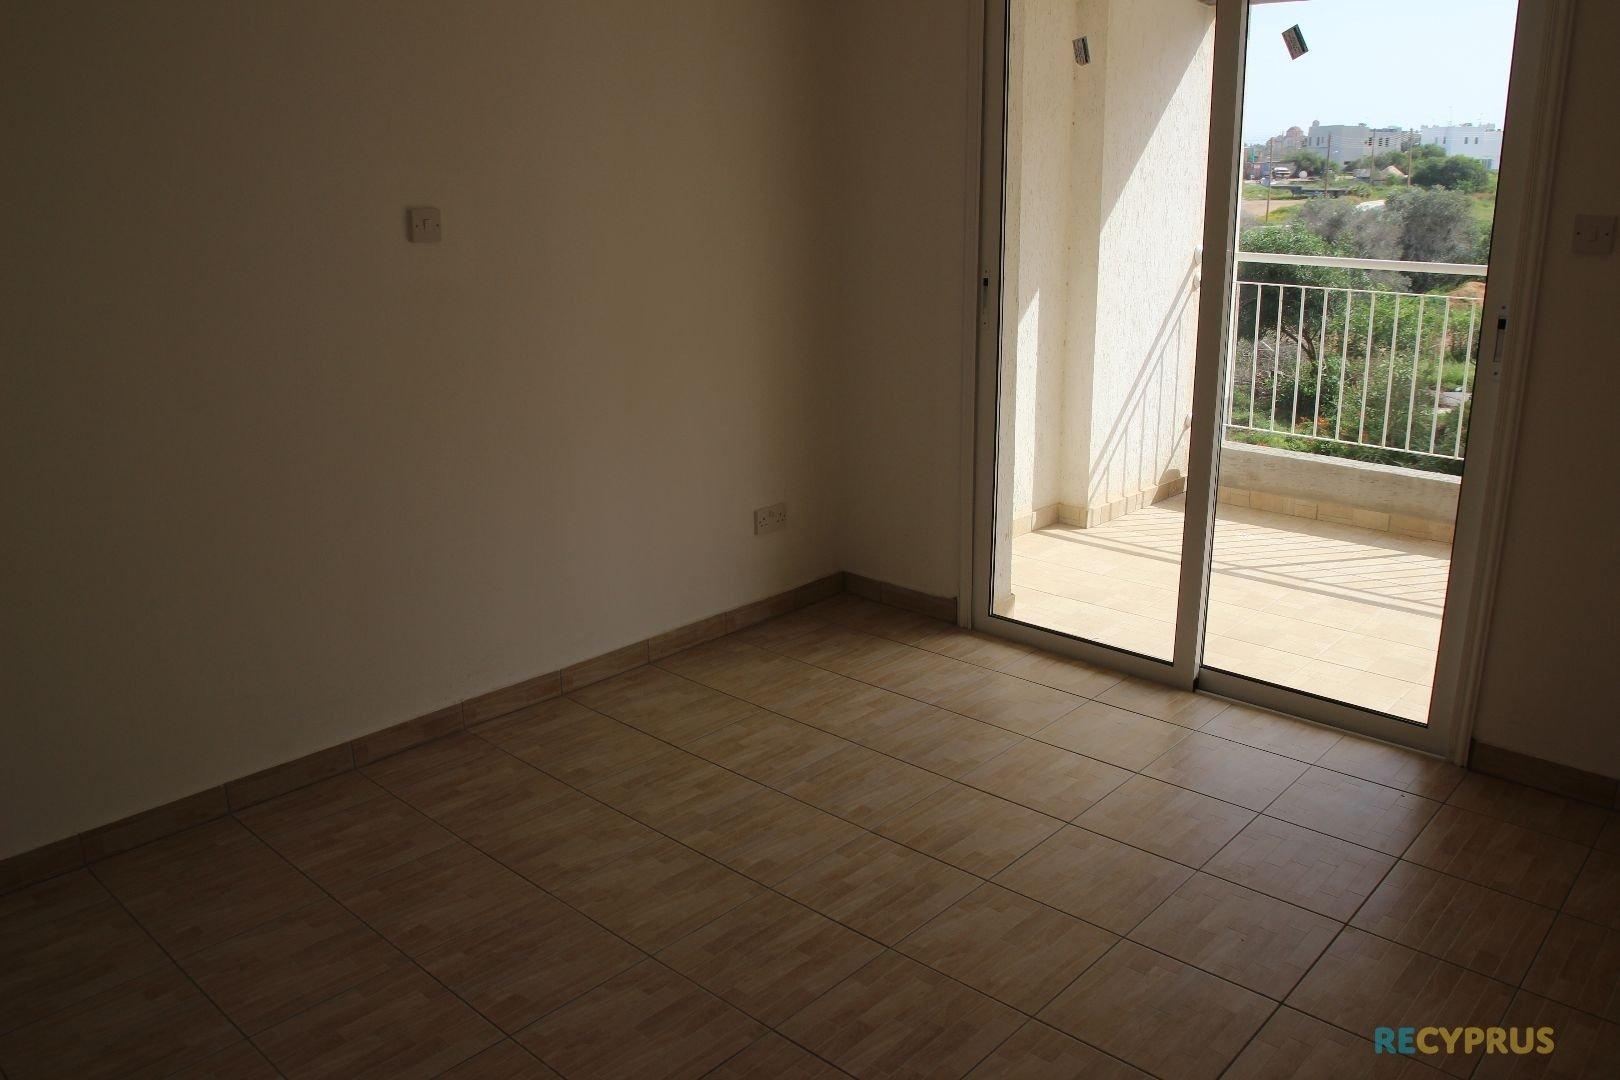 Apartment for sale Kapparis Famagusta Cyprus 9 3519